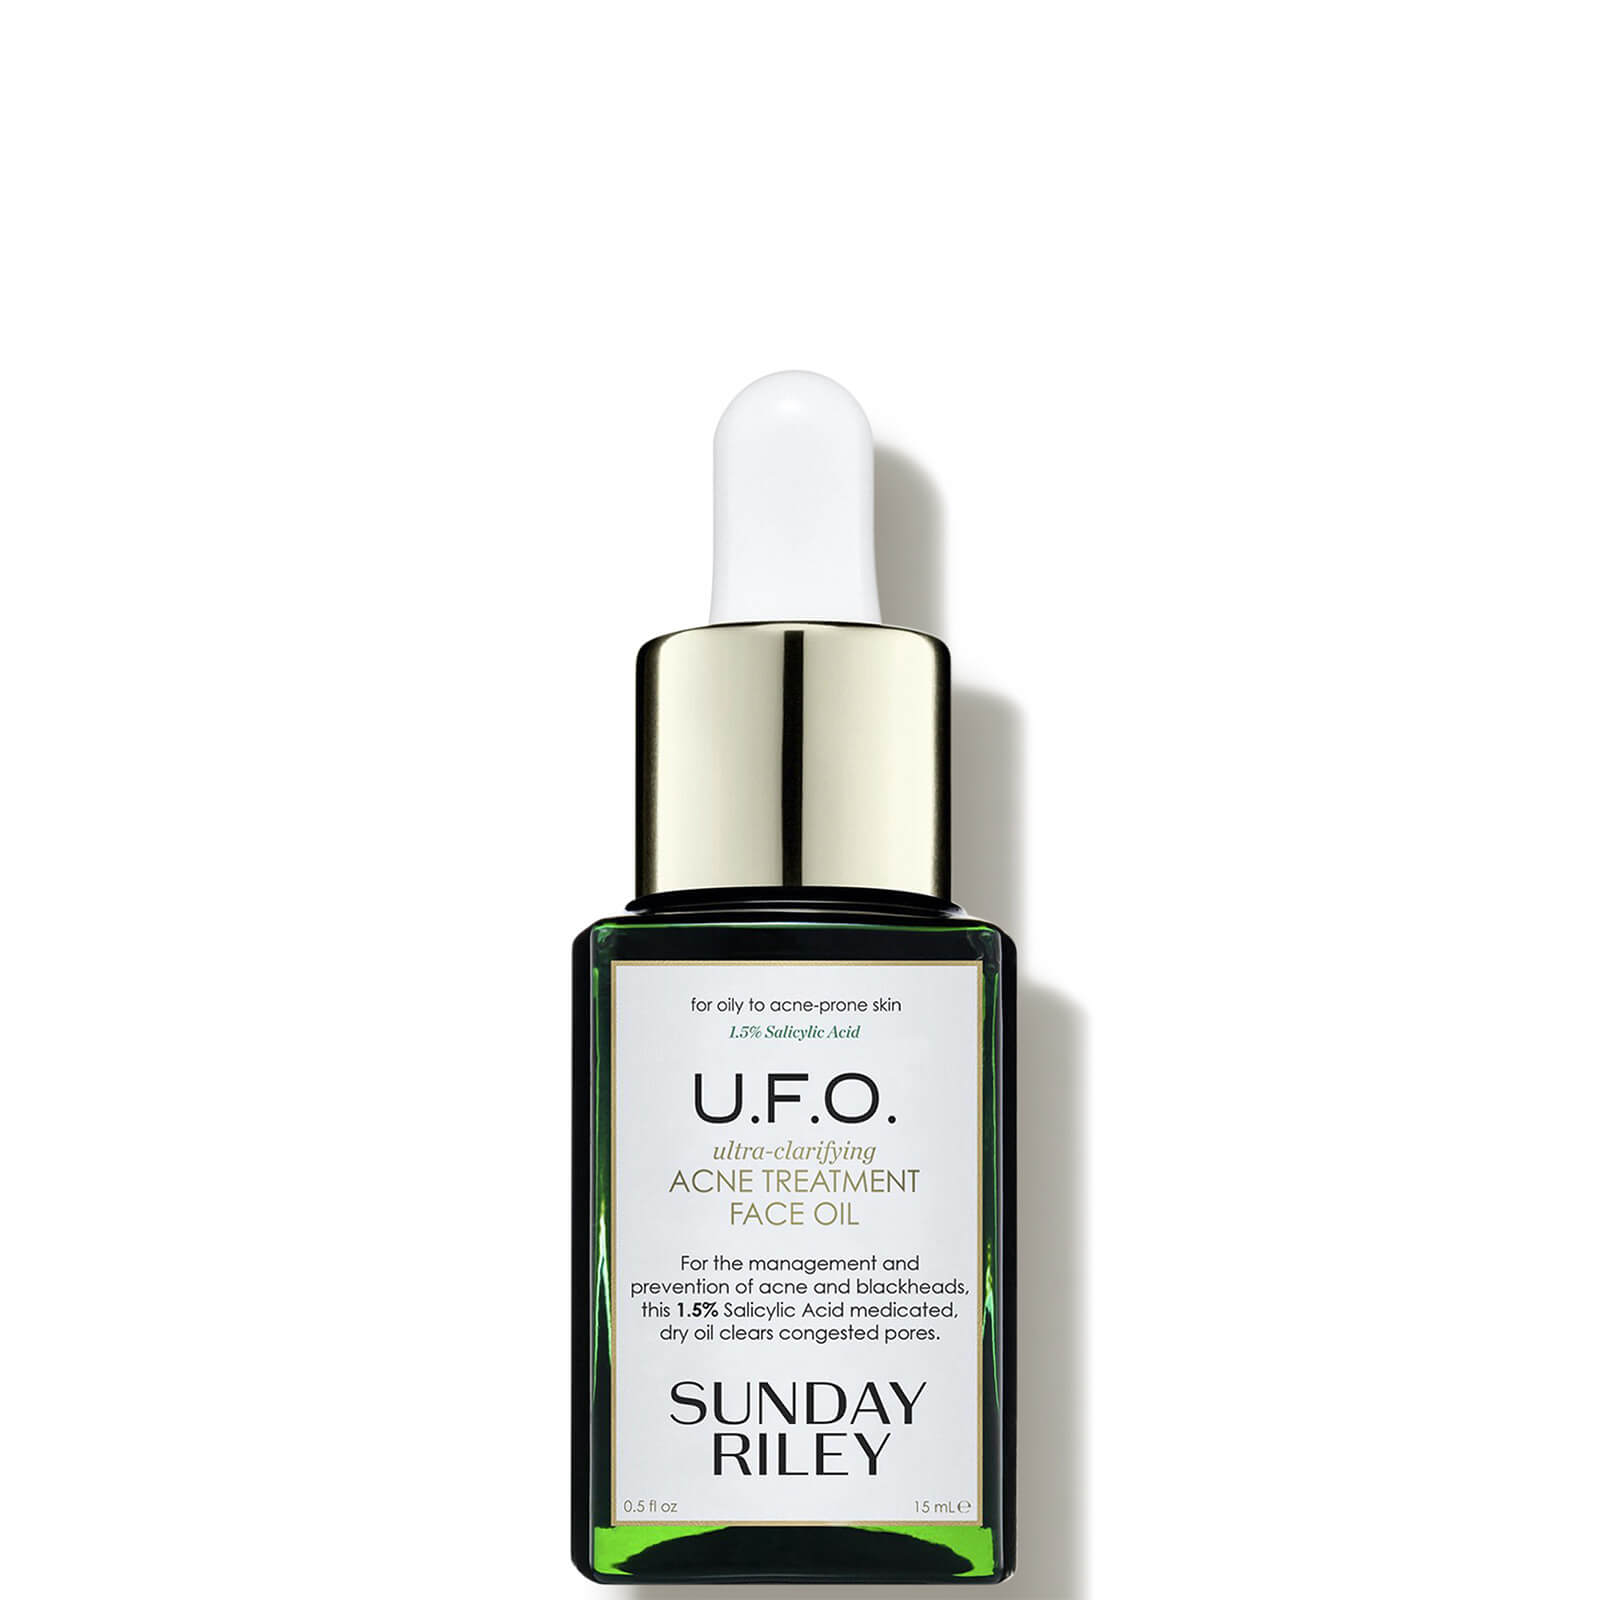 Watch a story about SUNDAY RILEY U.F.O. ULTRA-CLARIFYING FACE OIL 0.5OZ